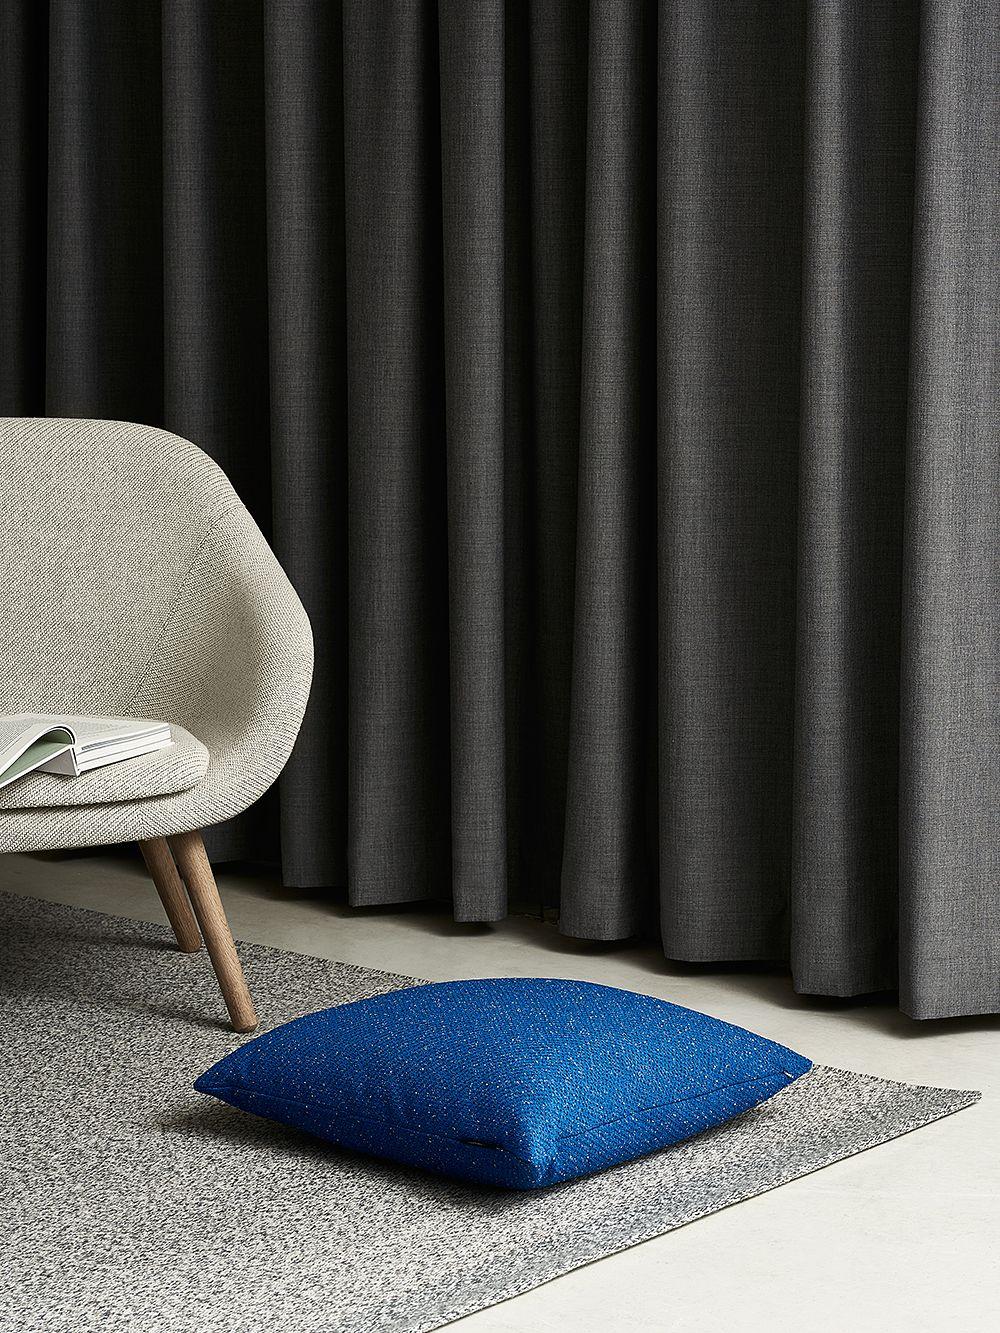 Kvadrat pushes the boundaries of textile design